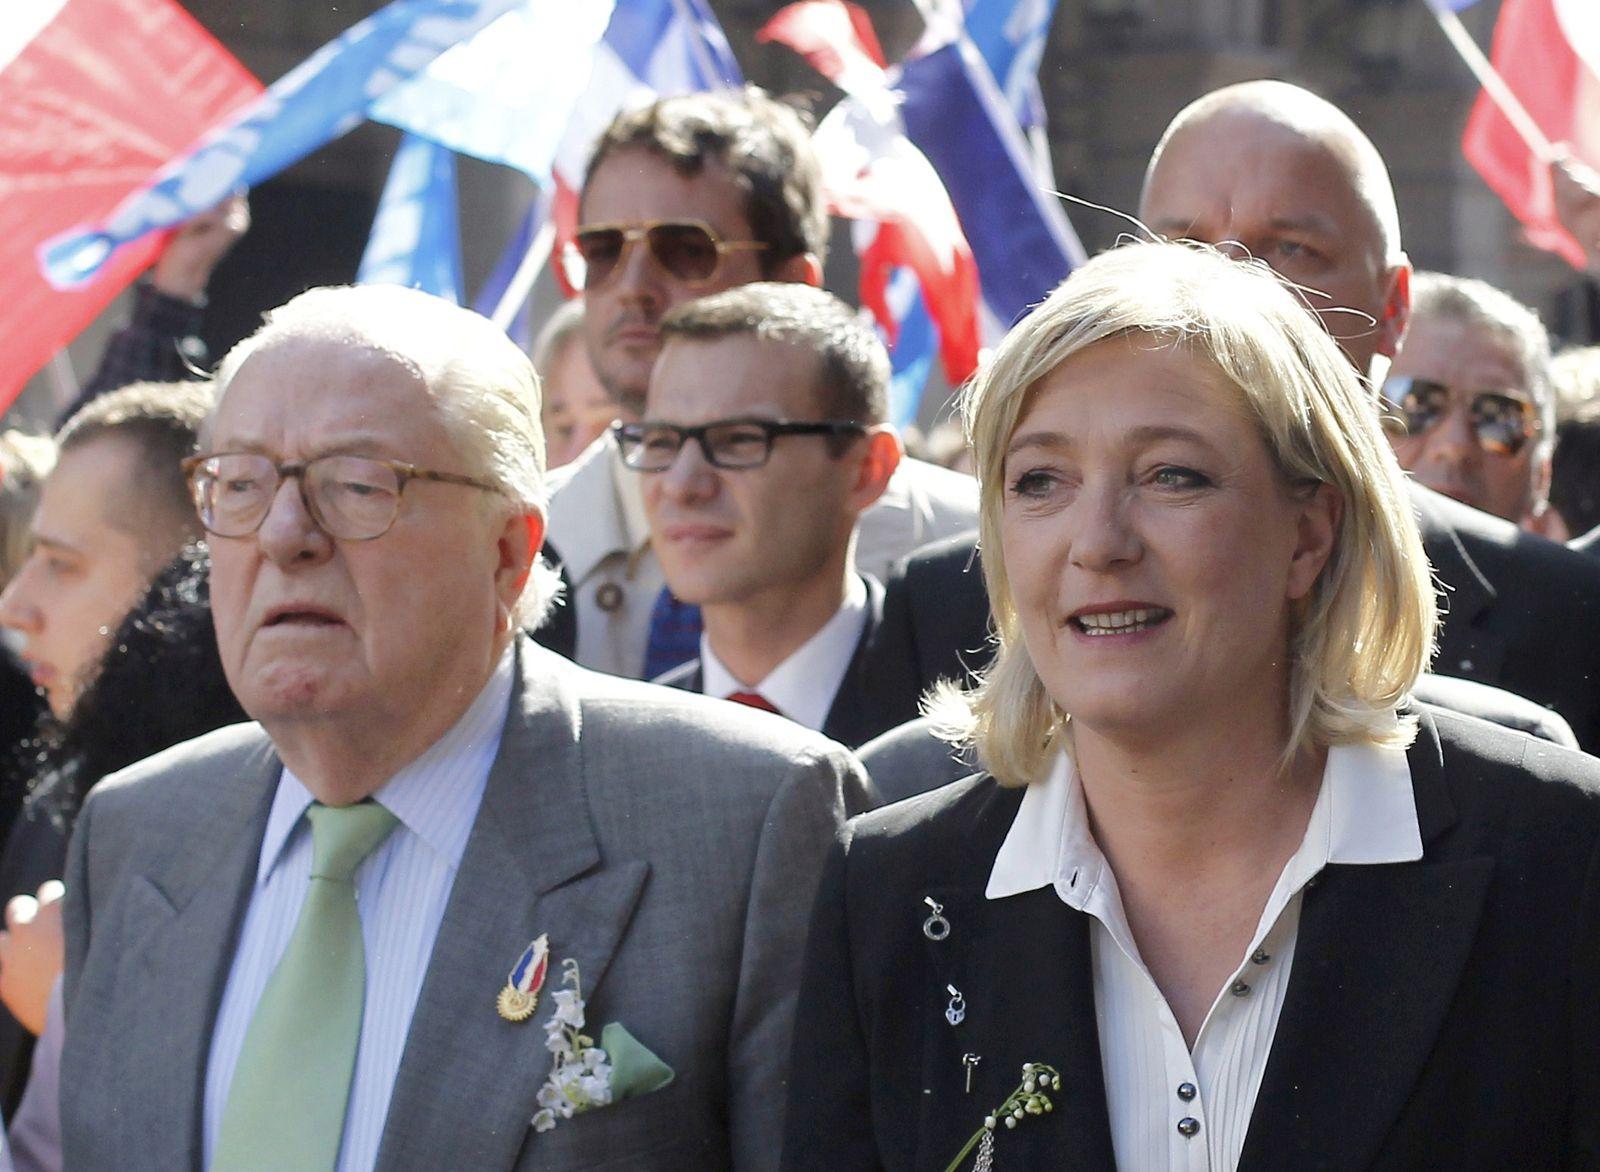 Marine Le Pen/ Jean-Marie Le Pen